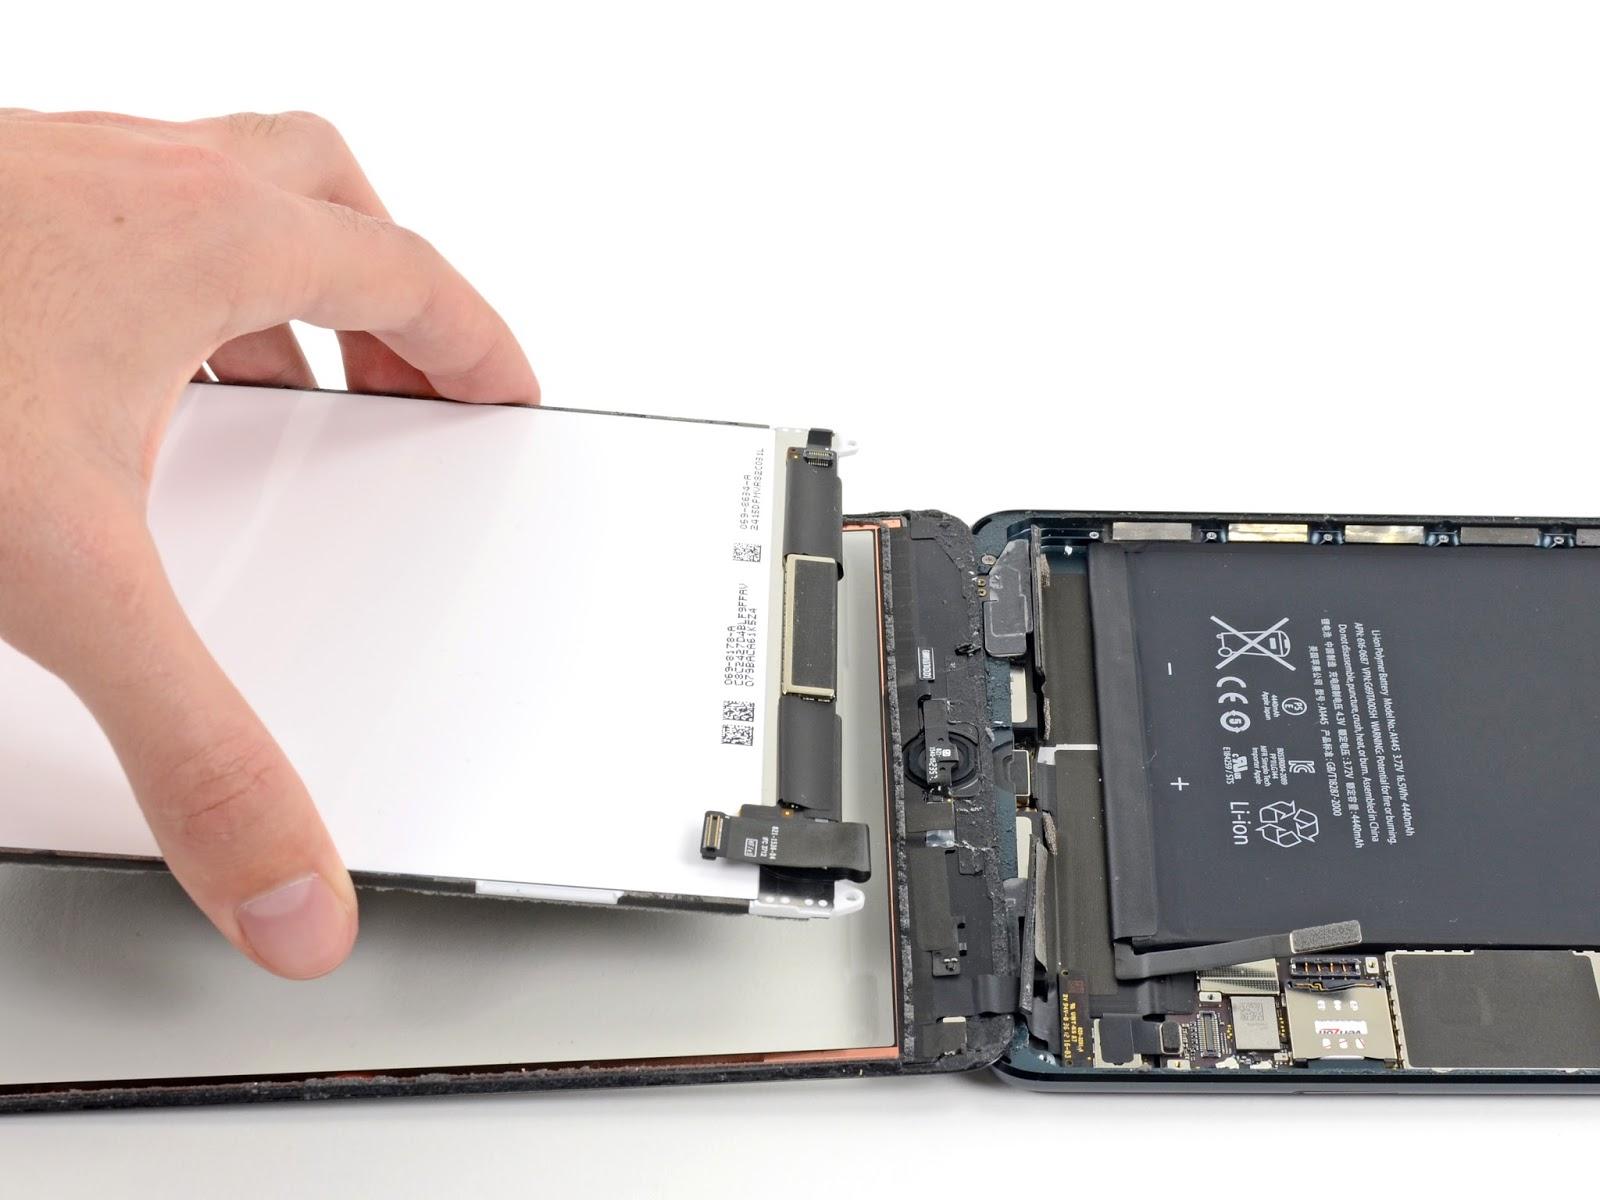 Замена аккумулятора на ipad 4 своими руками